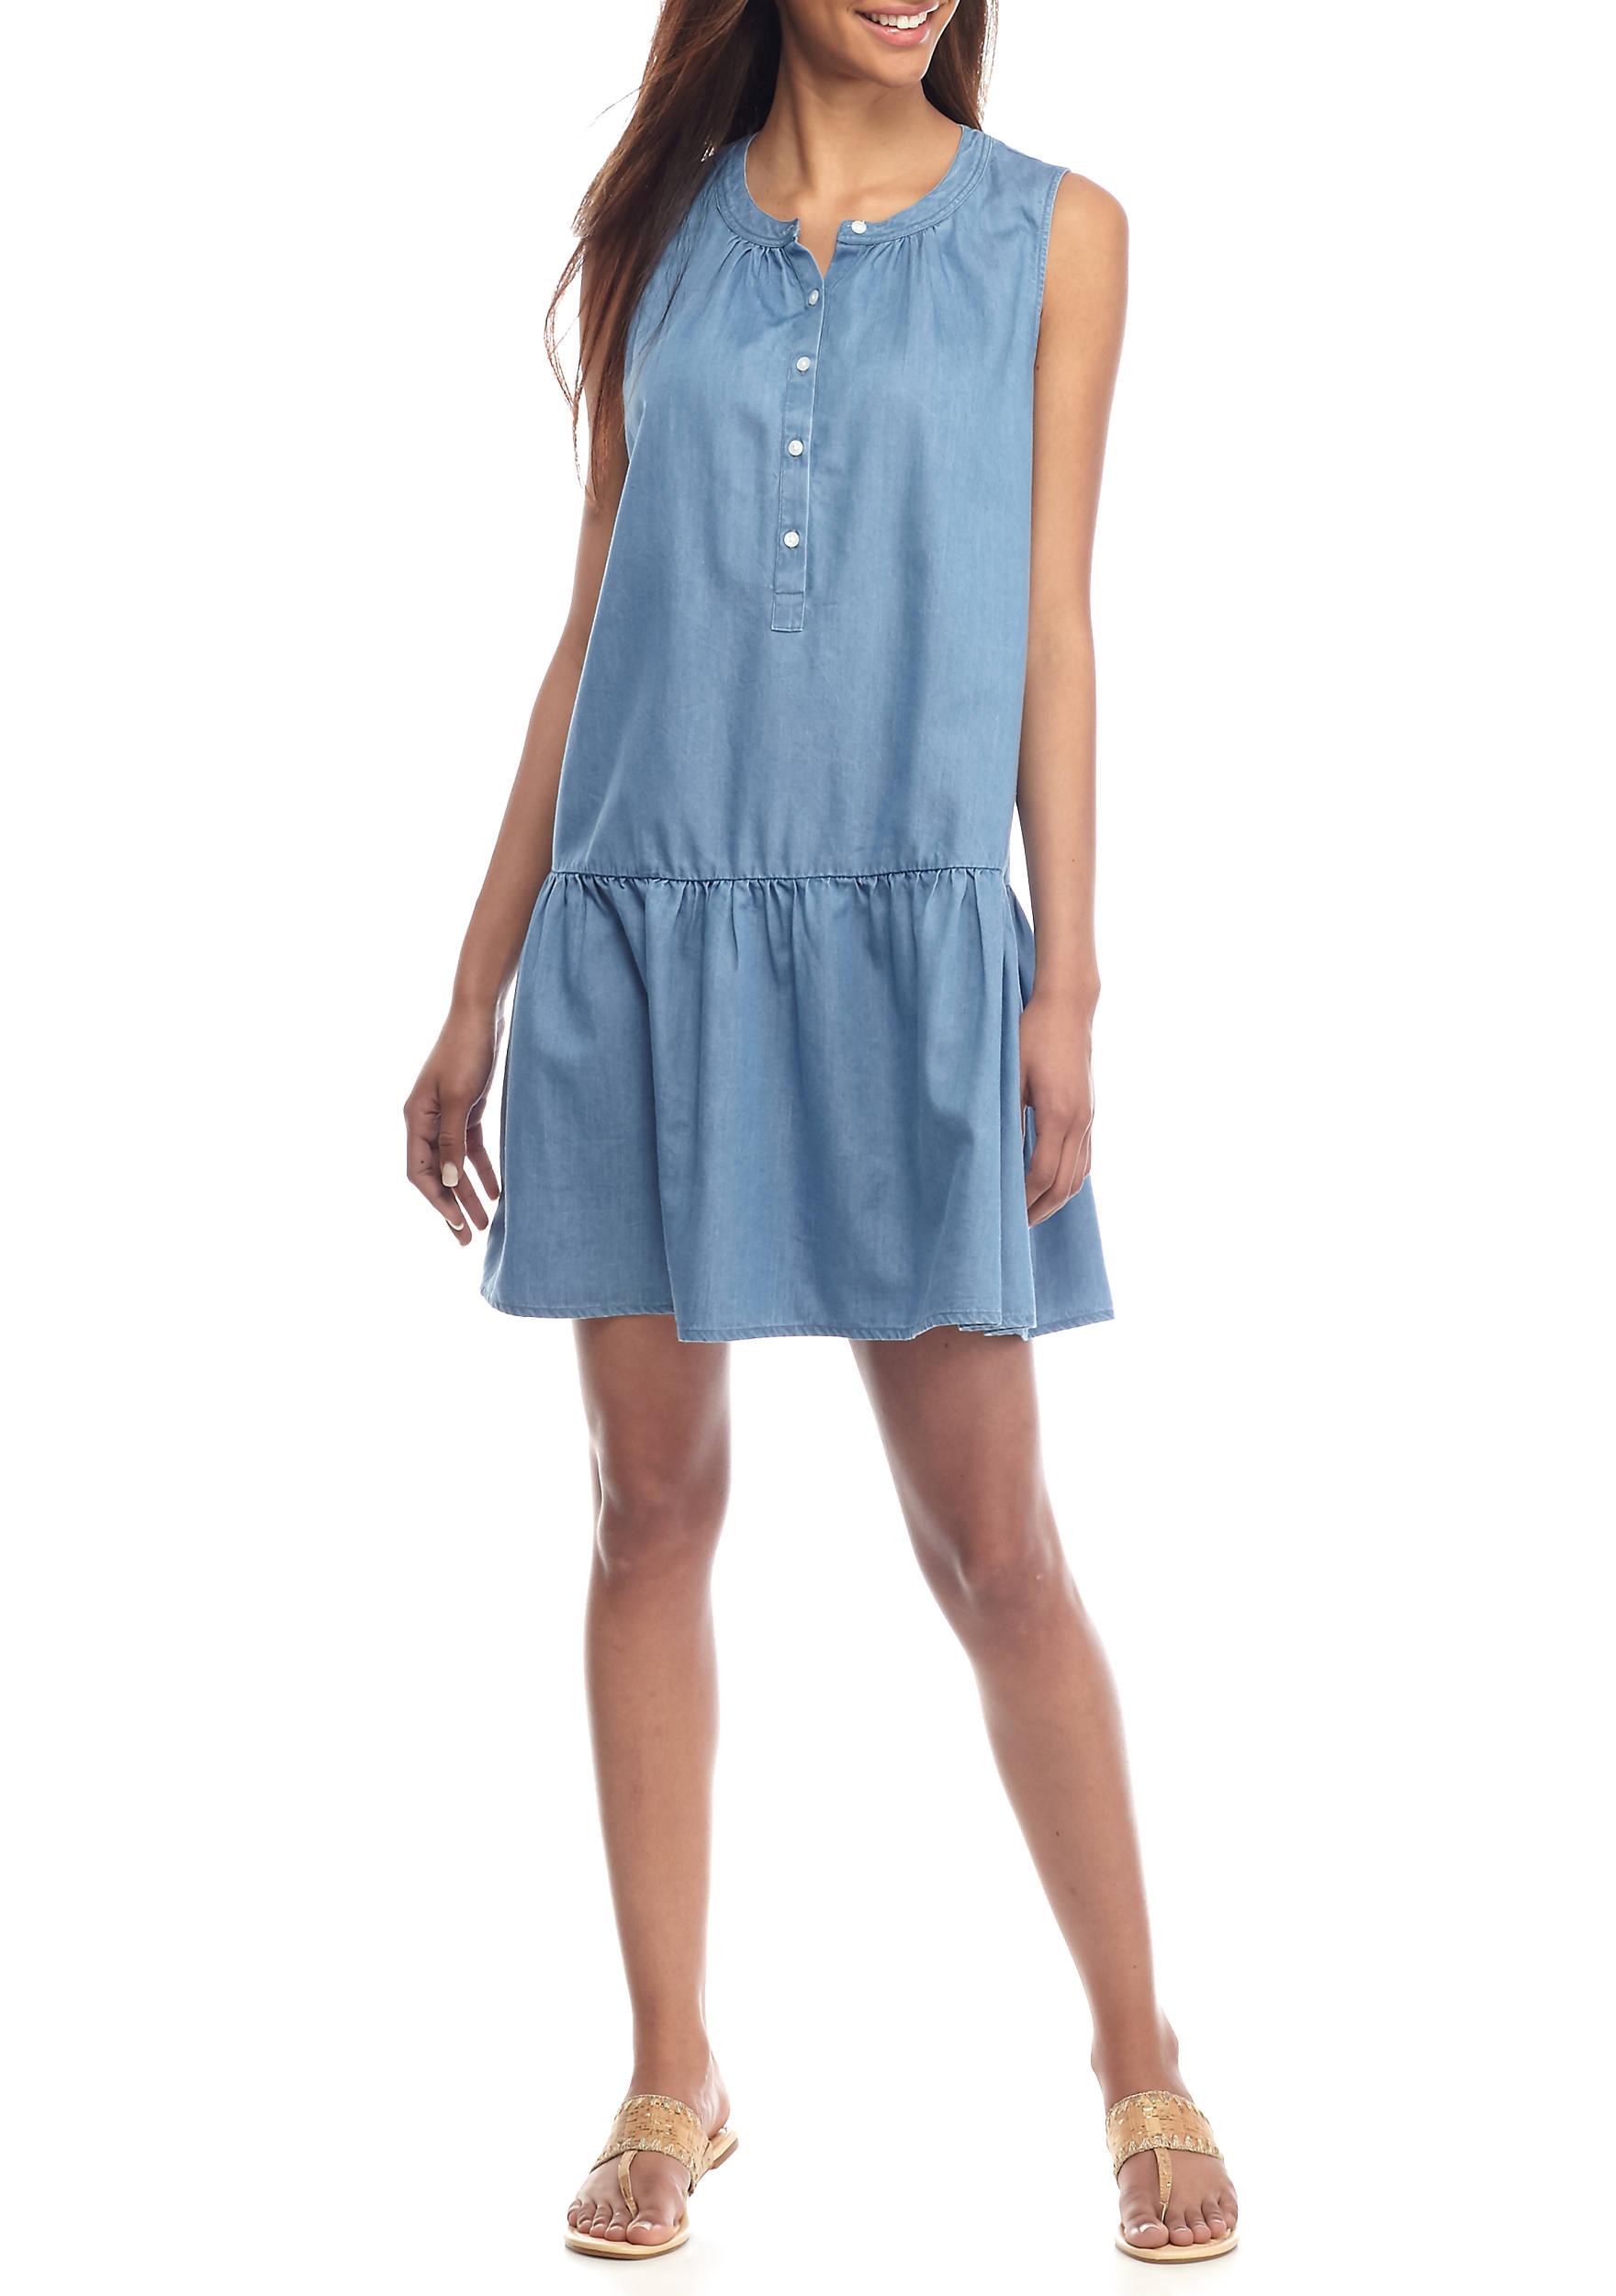 Crown & Ivy™ Sleeveless Chambray Dress | belk